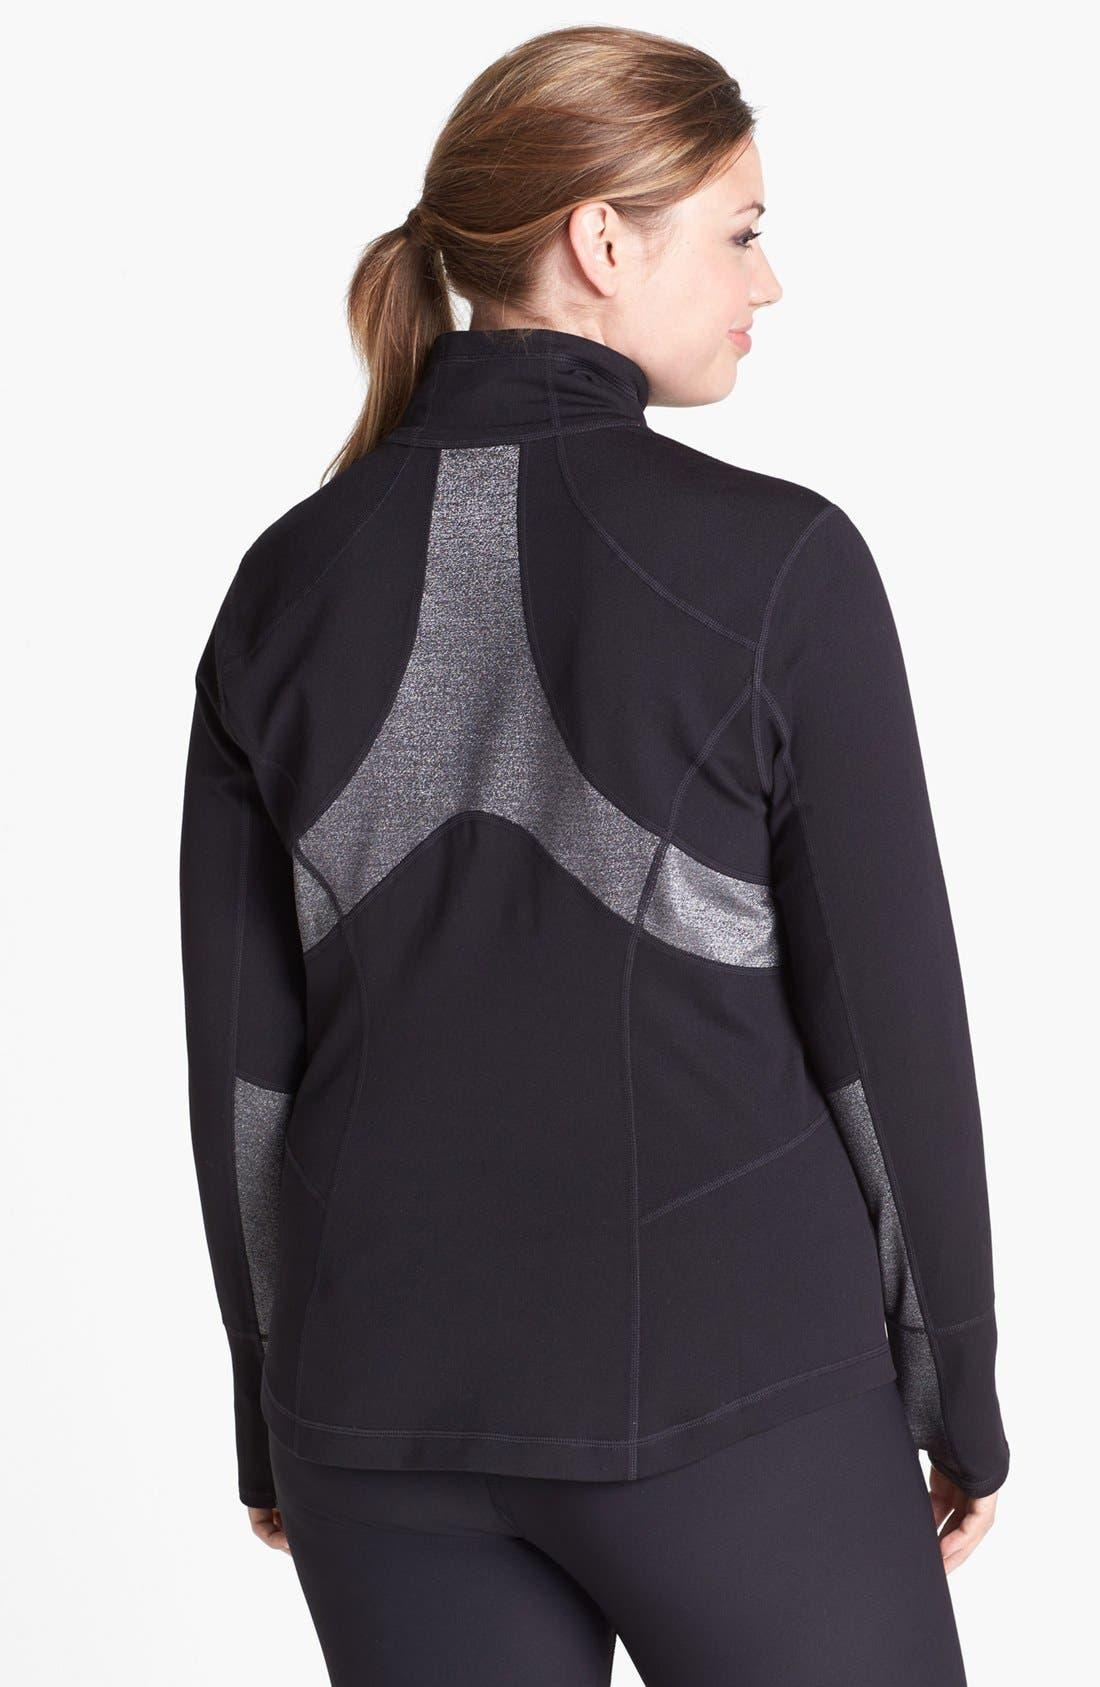 Alternate Image 1 Selected - Zella 'Luxe Mix' Jacket (Plus Size)